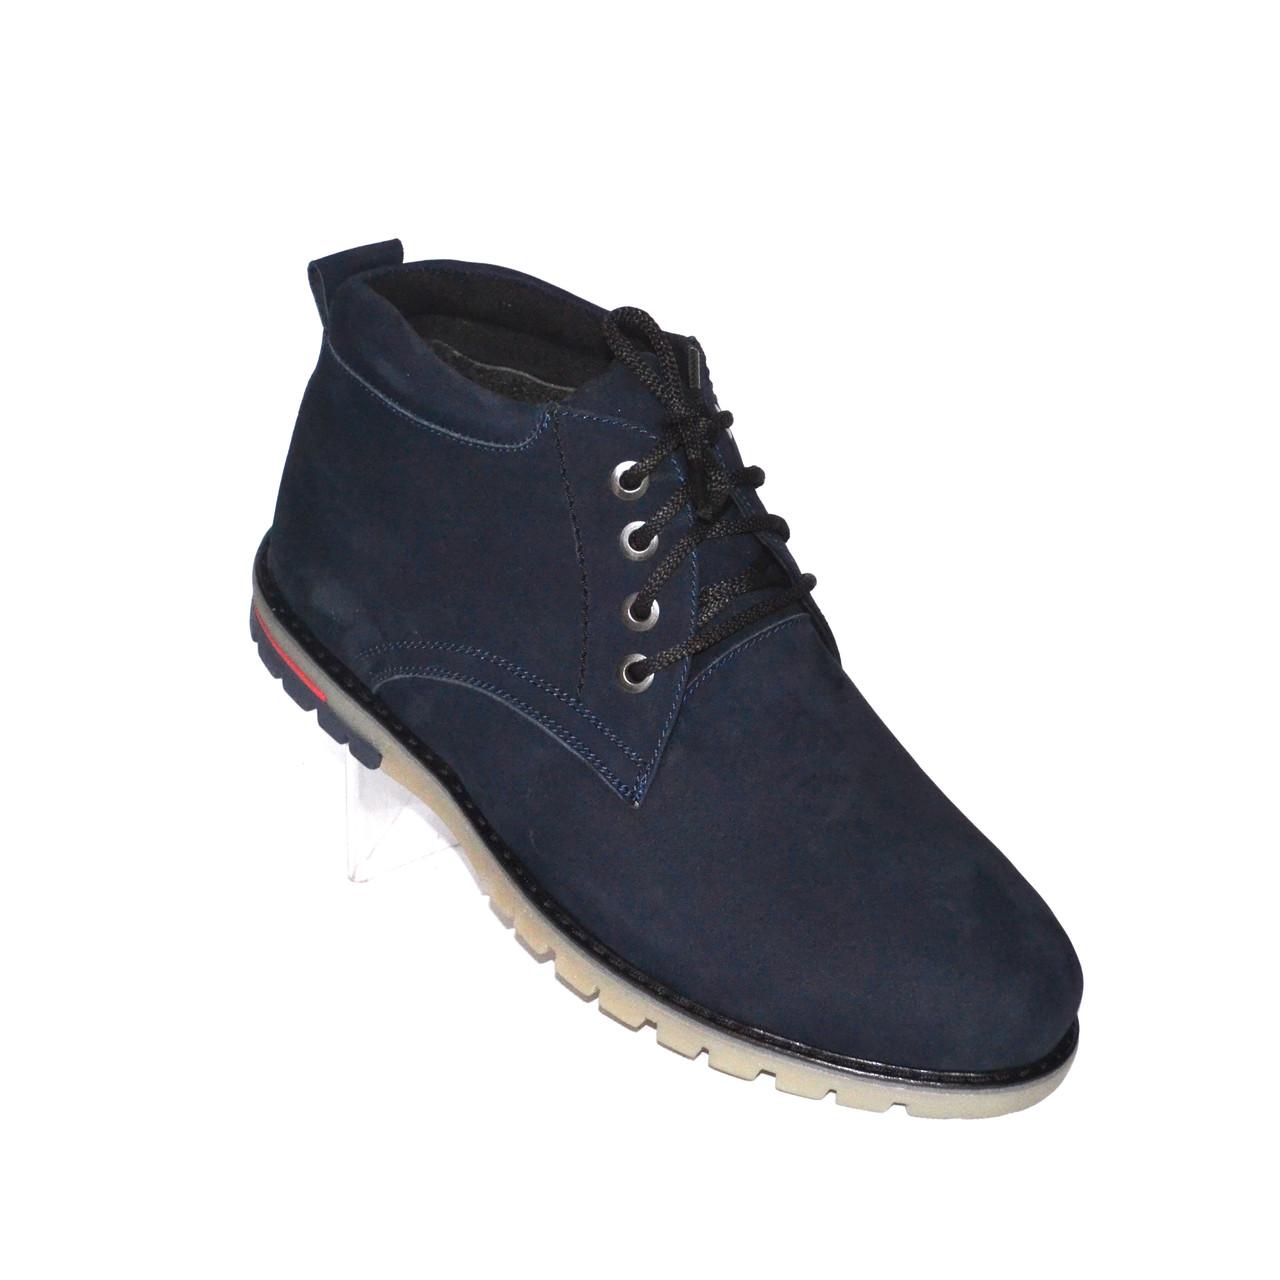 f159e7464 Замшевые зимние мужские ботинки натуральные, на меху Rosso Avangard.  Bonmarito Vel Blu синие -